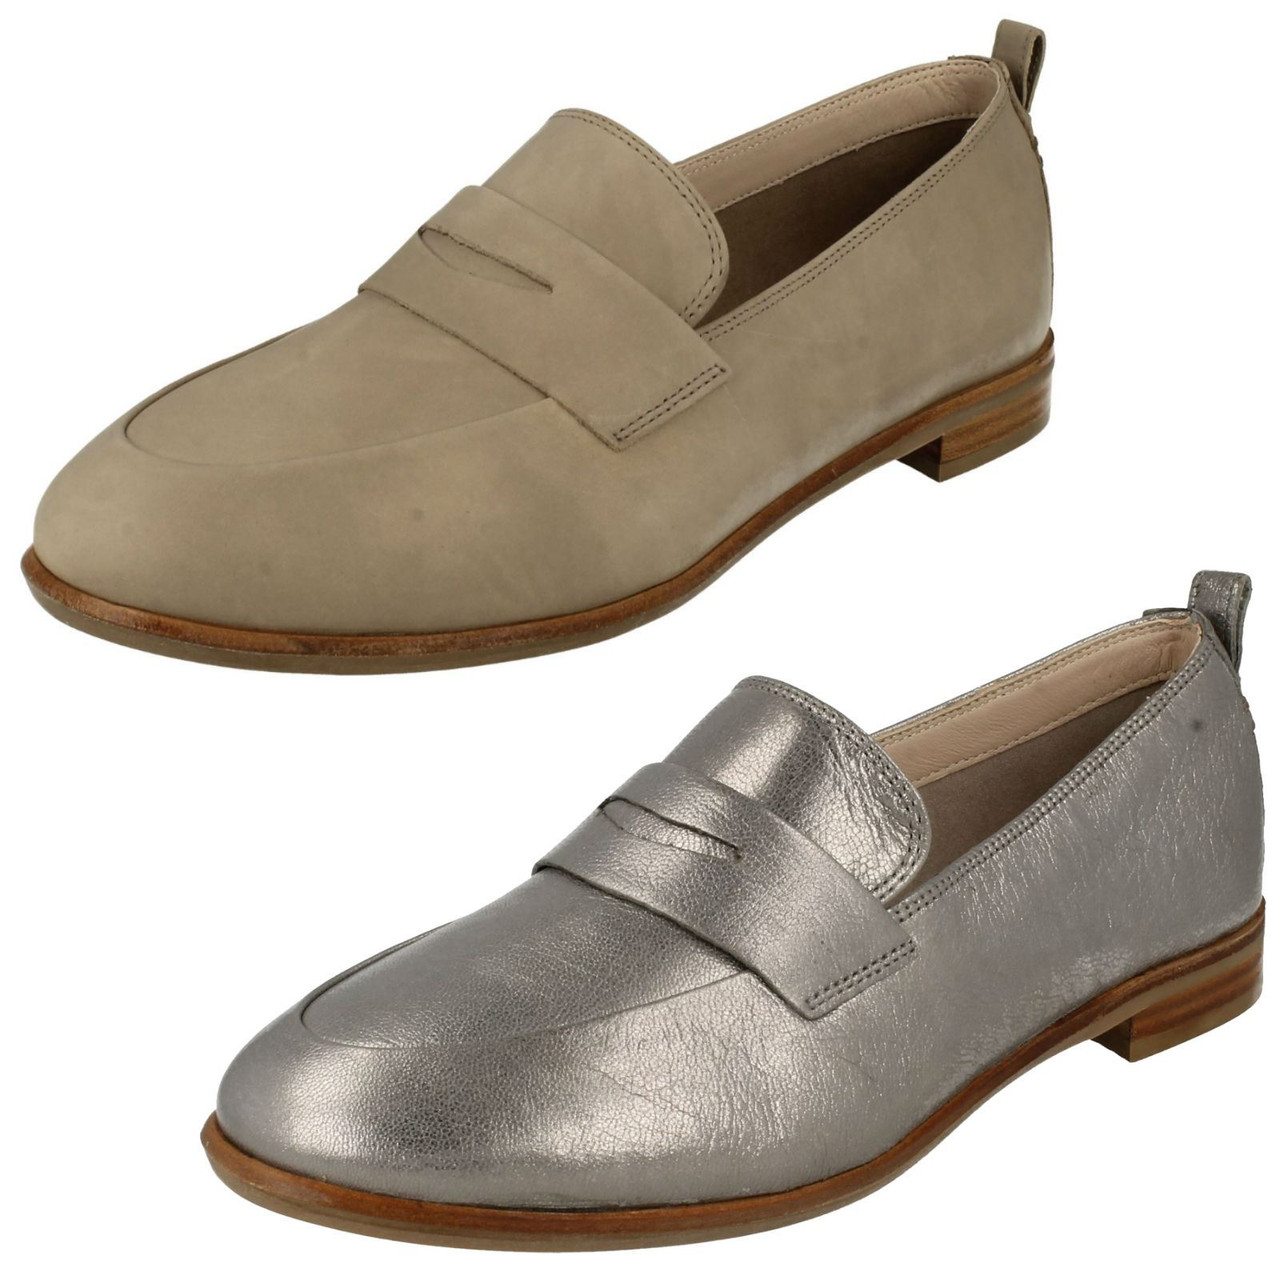 Ladies Clarks Smart Slip On Loafers